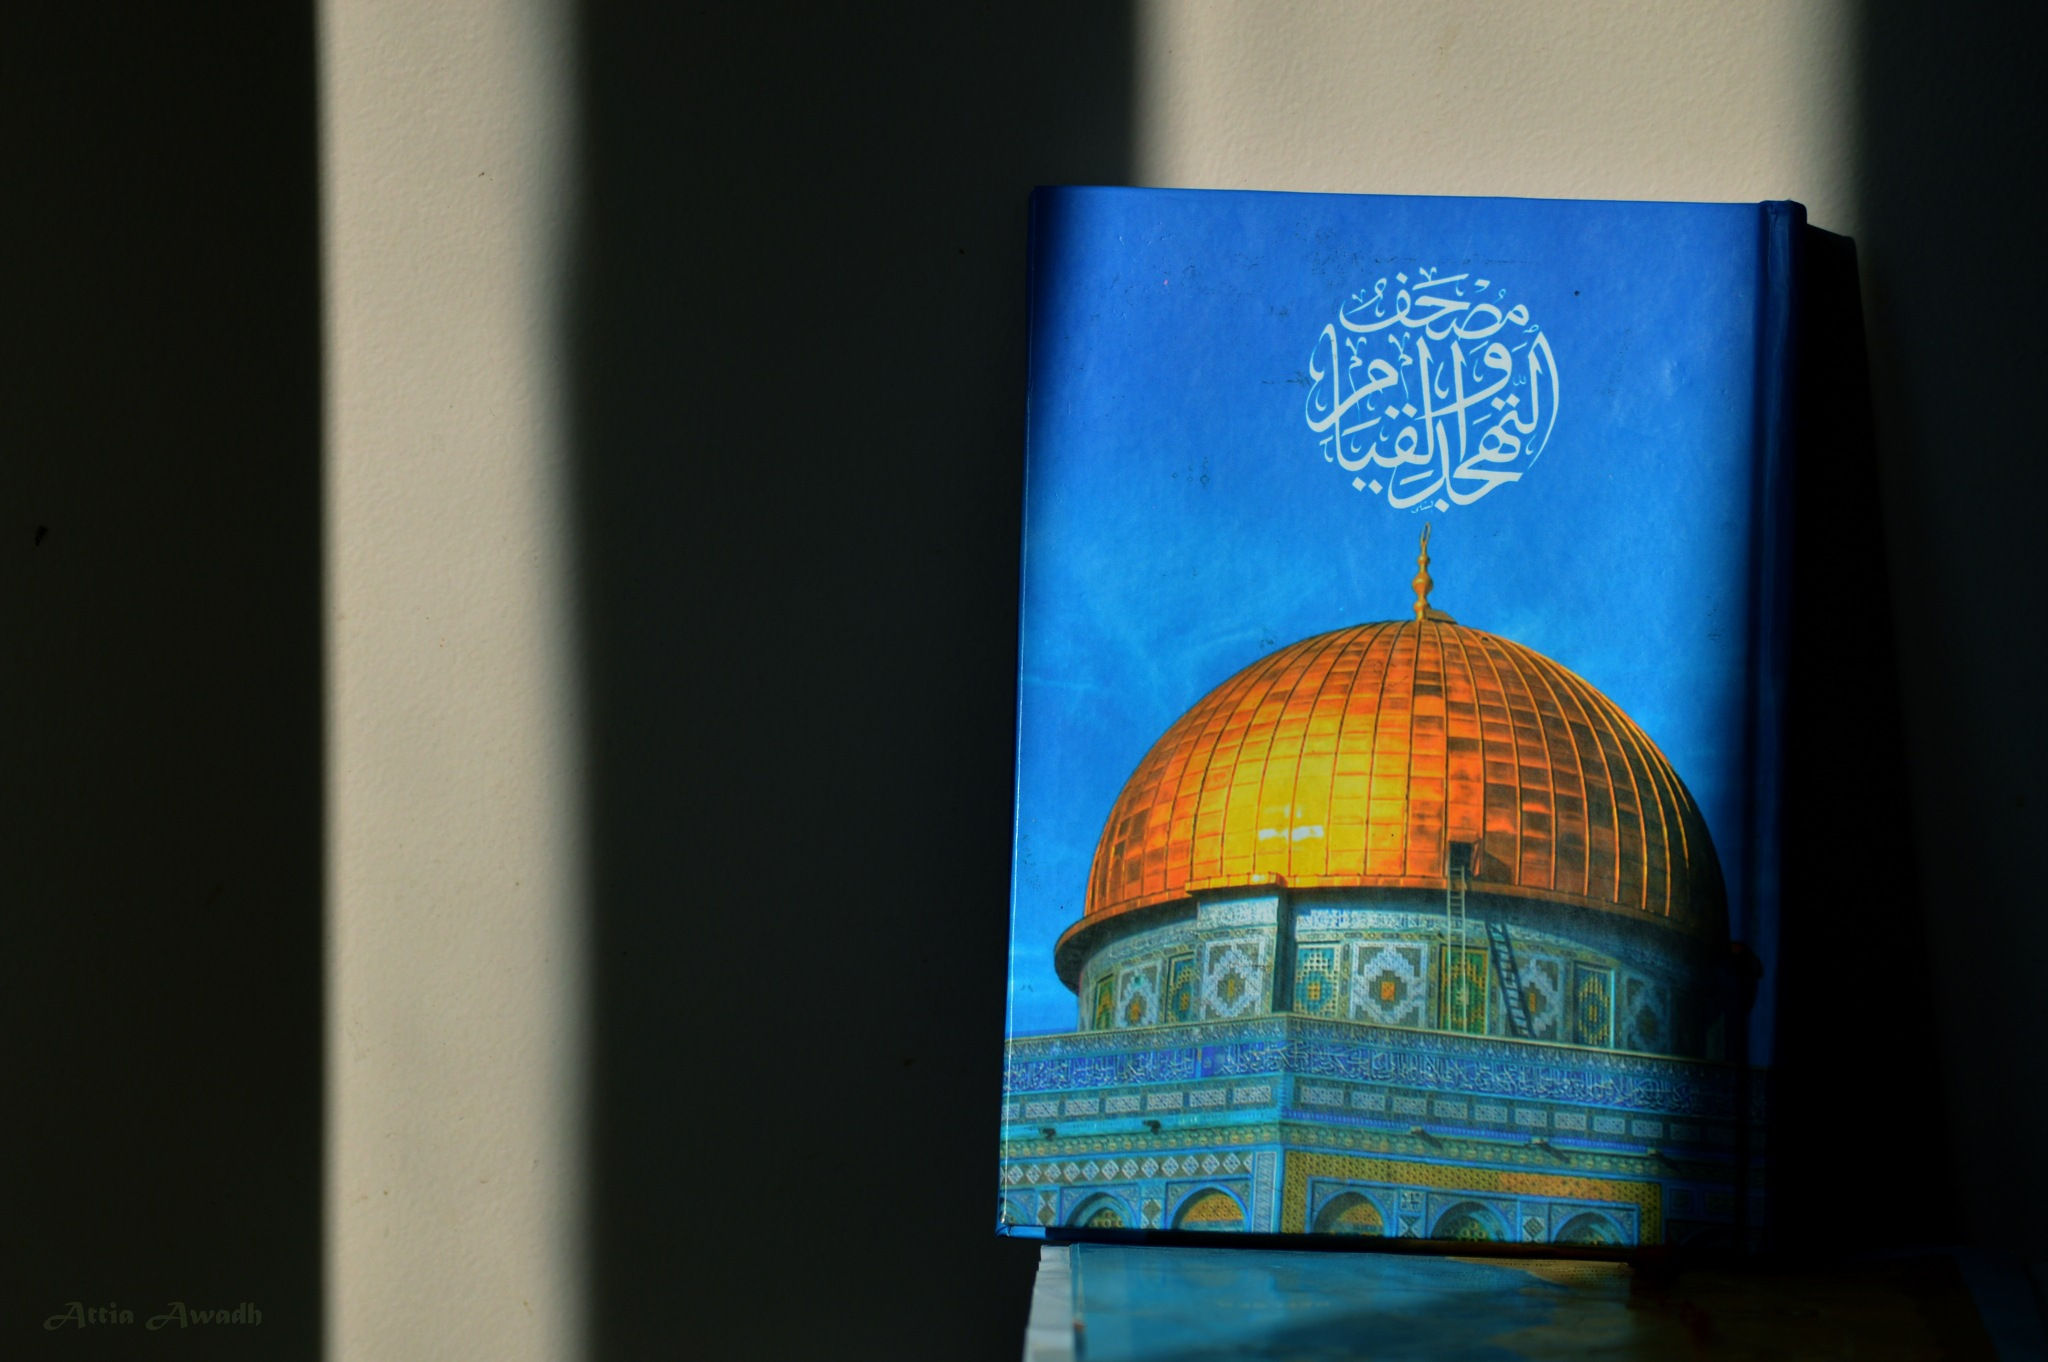 Al Aqsa الأقصي by Attia Awadh